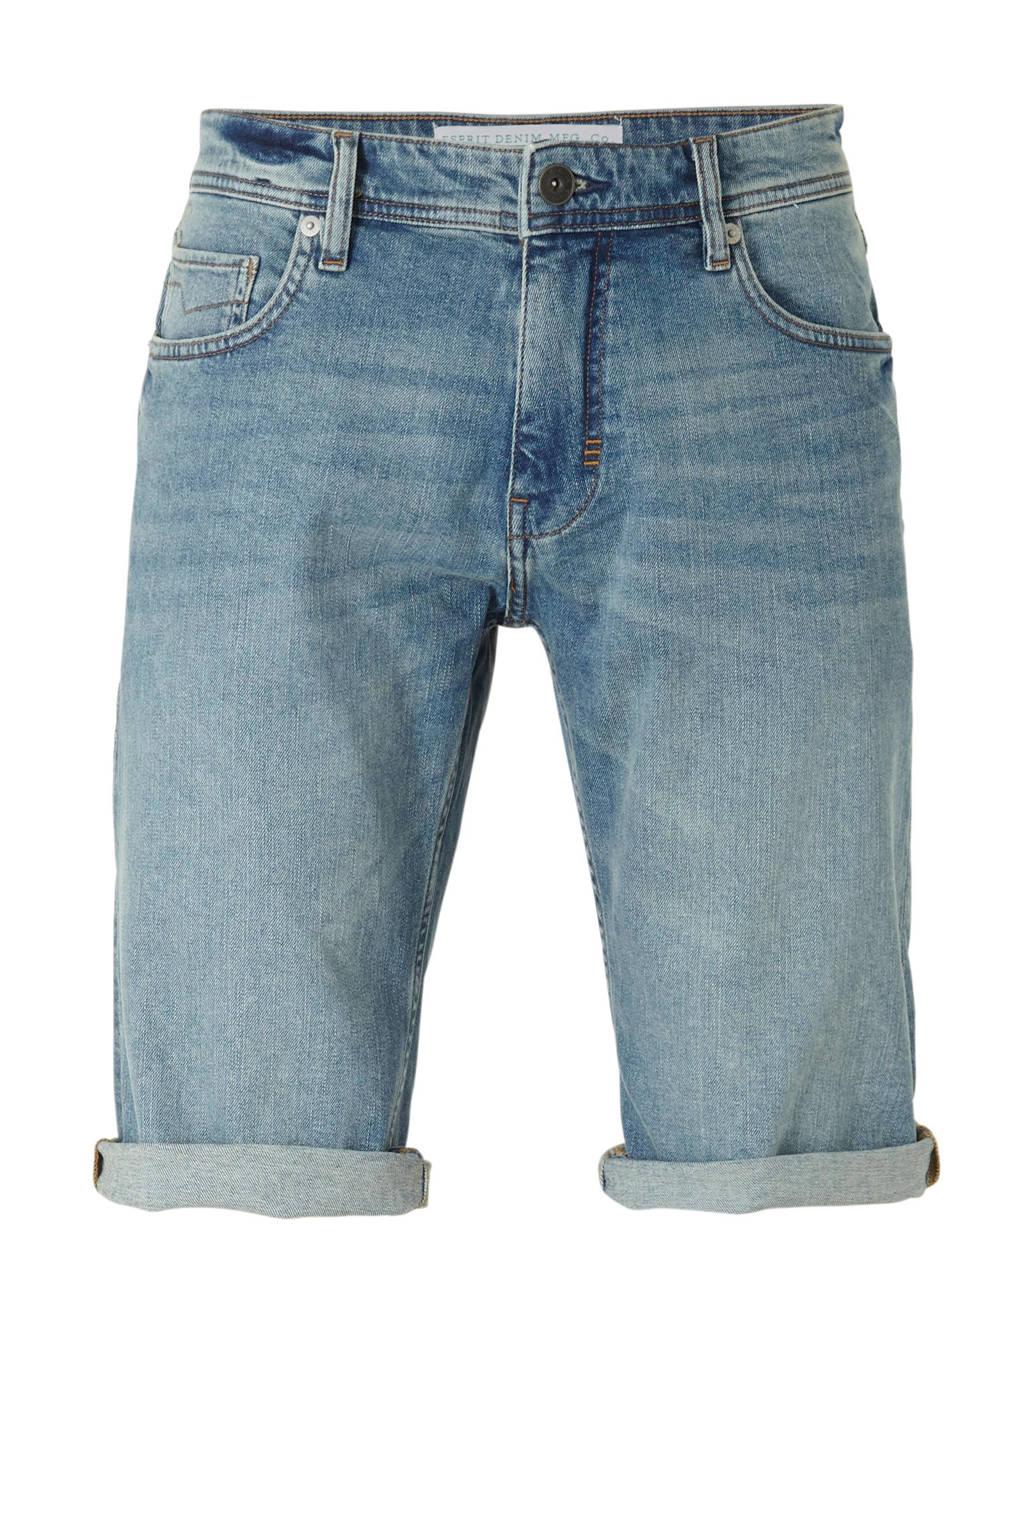 ESPRIT Men Casual regular fit jeans short, Blauw